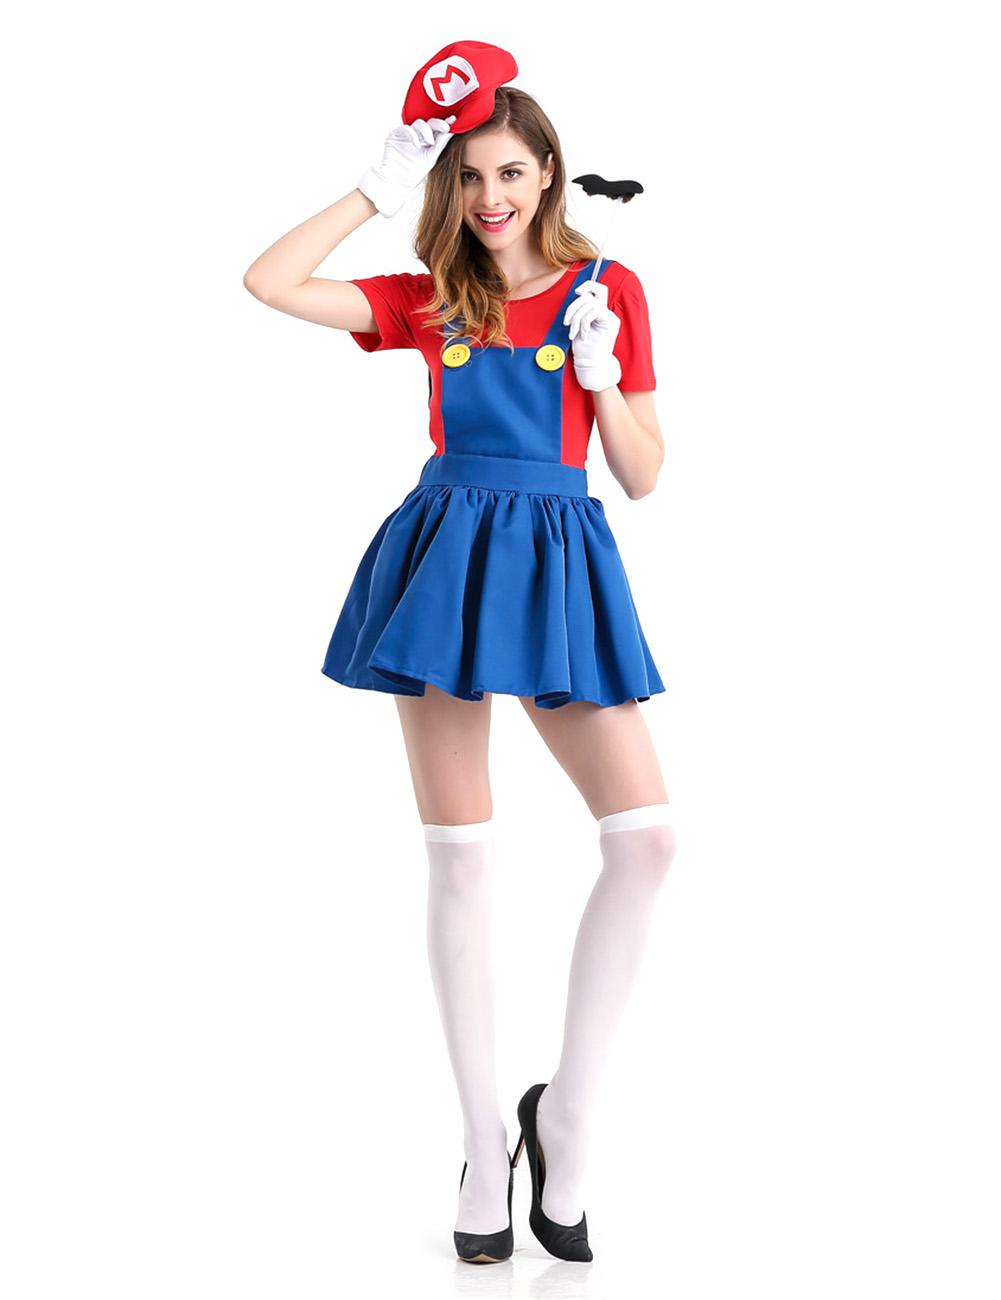 5PCS/Set Women Suspender Skirt Set Stylish Performance Costume for Halloween Fancy Dress Ball red_XL